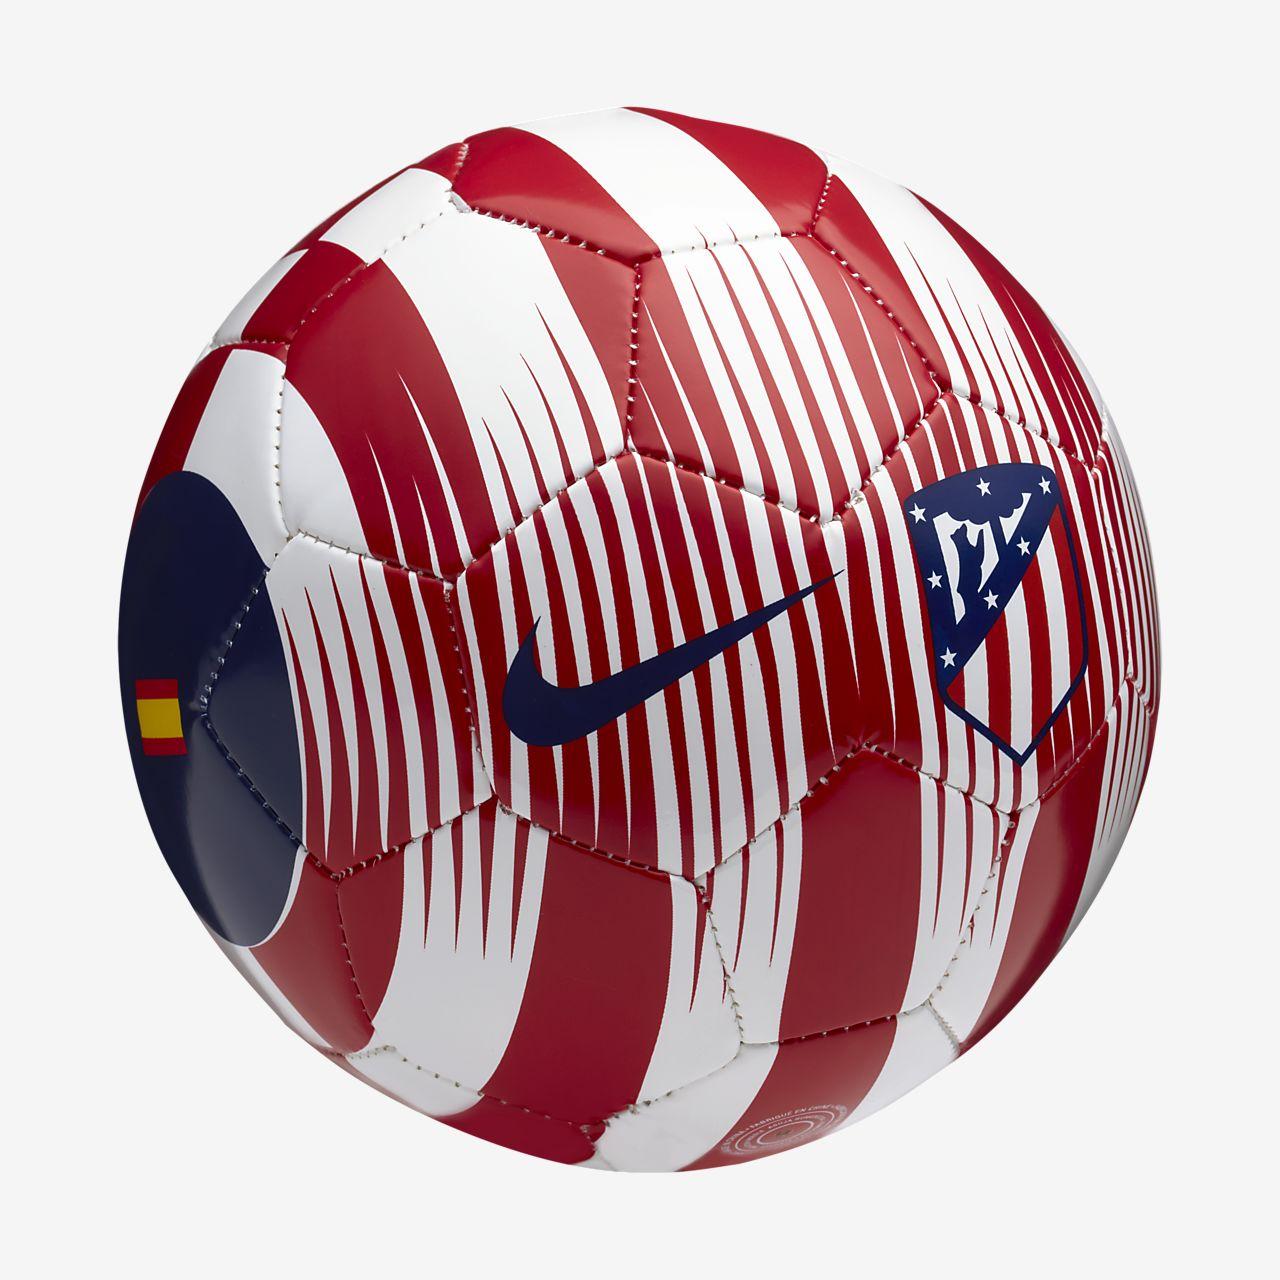 339dbc916effa Atlético de Madrid Skills Balón de fútbol. Nike.com ES